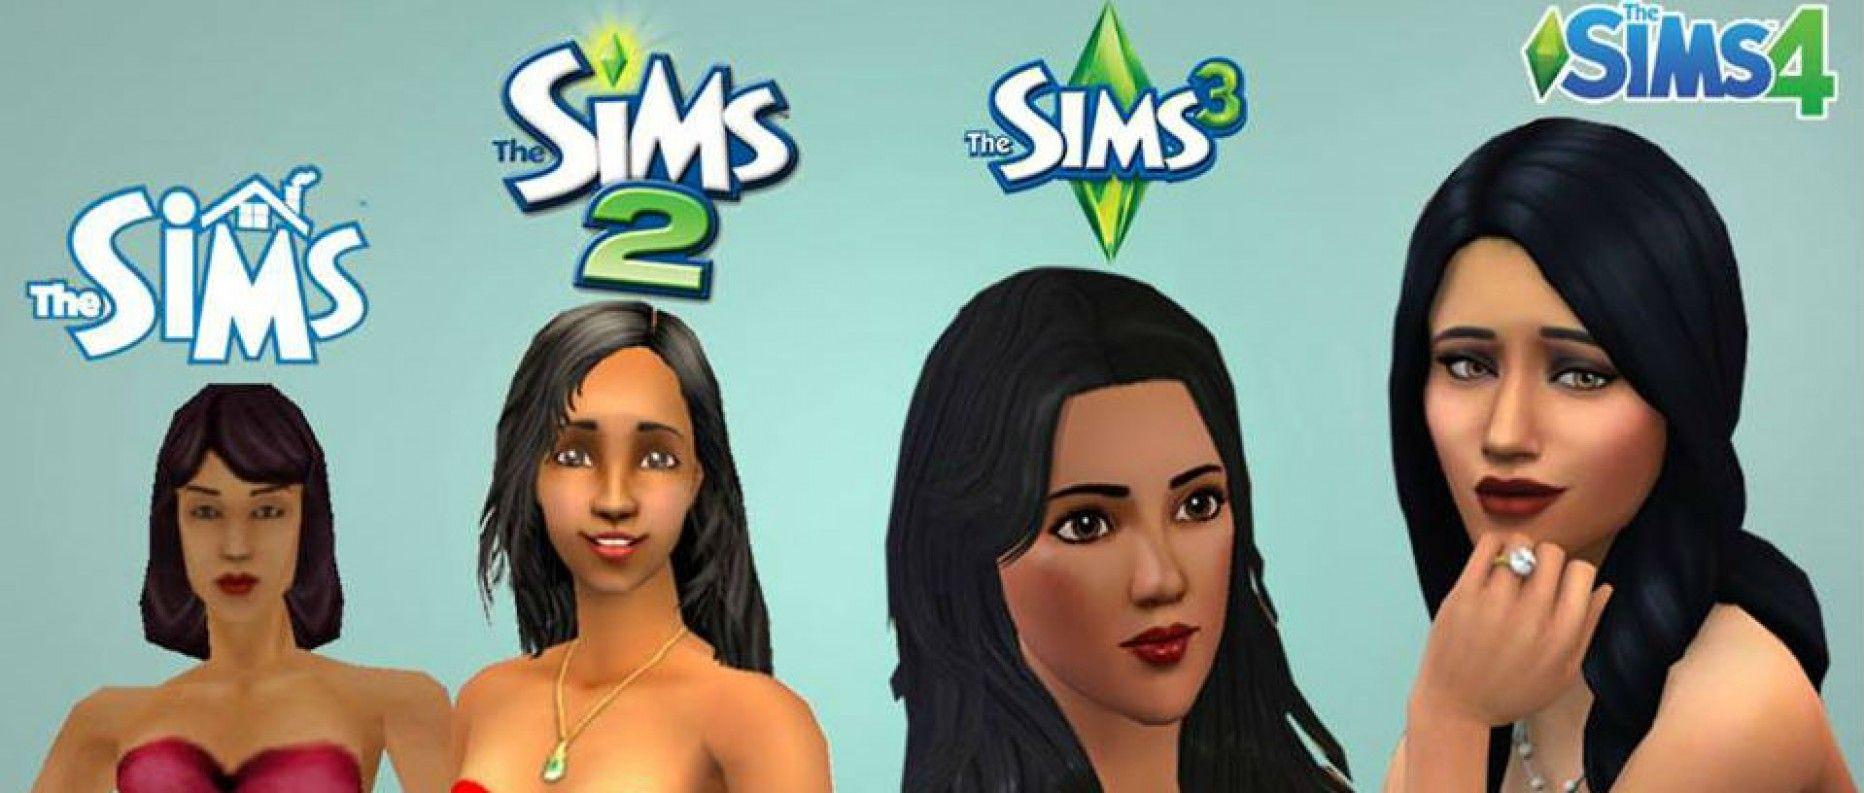 f968ef1a7f2a42d8ab8b8aaff5c78791 - How To Get More Hairstyles On Sims 3 Xbox 360